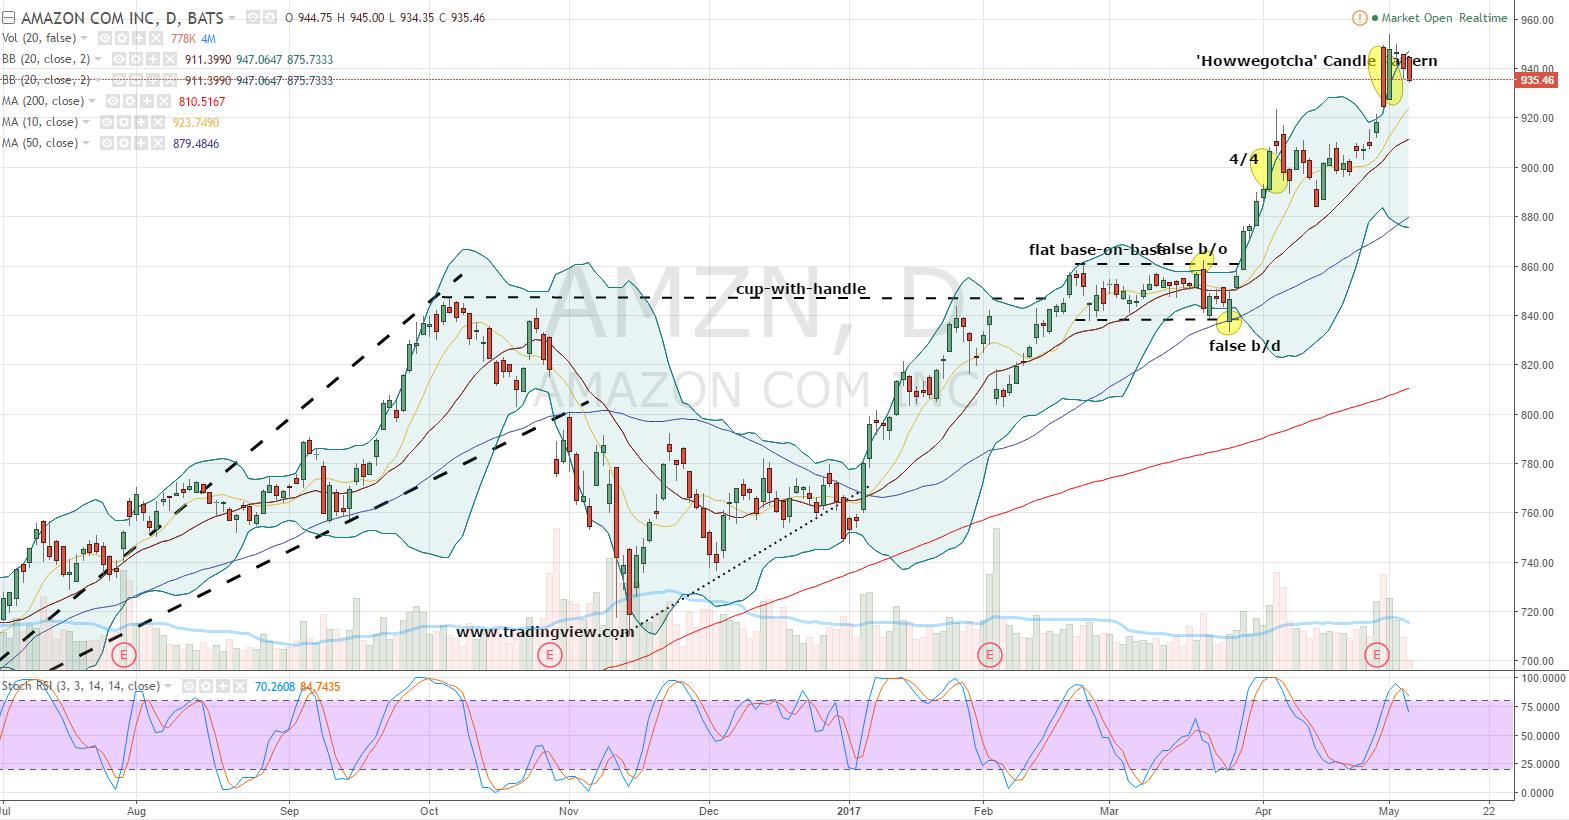 Go Long Amazon, Inc (amzn) Stock For Free! Investorplace